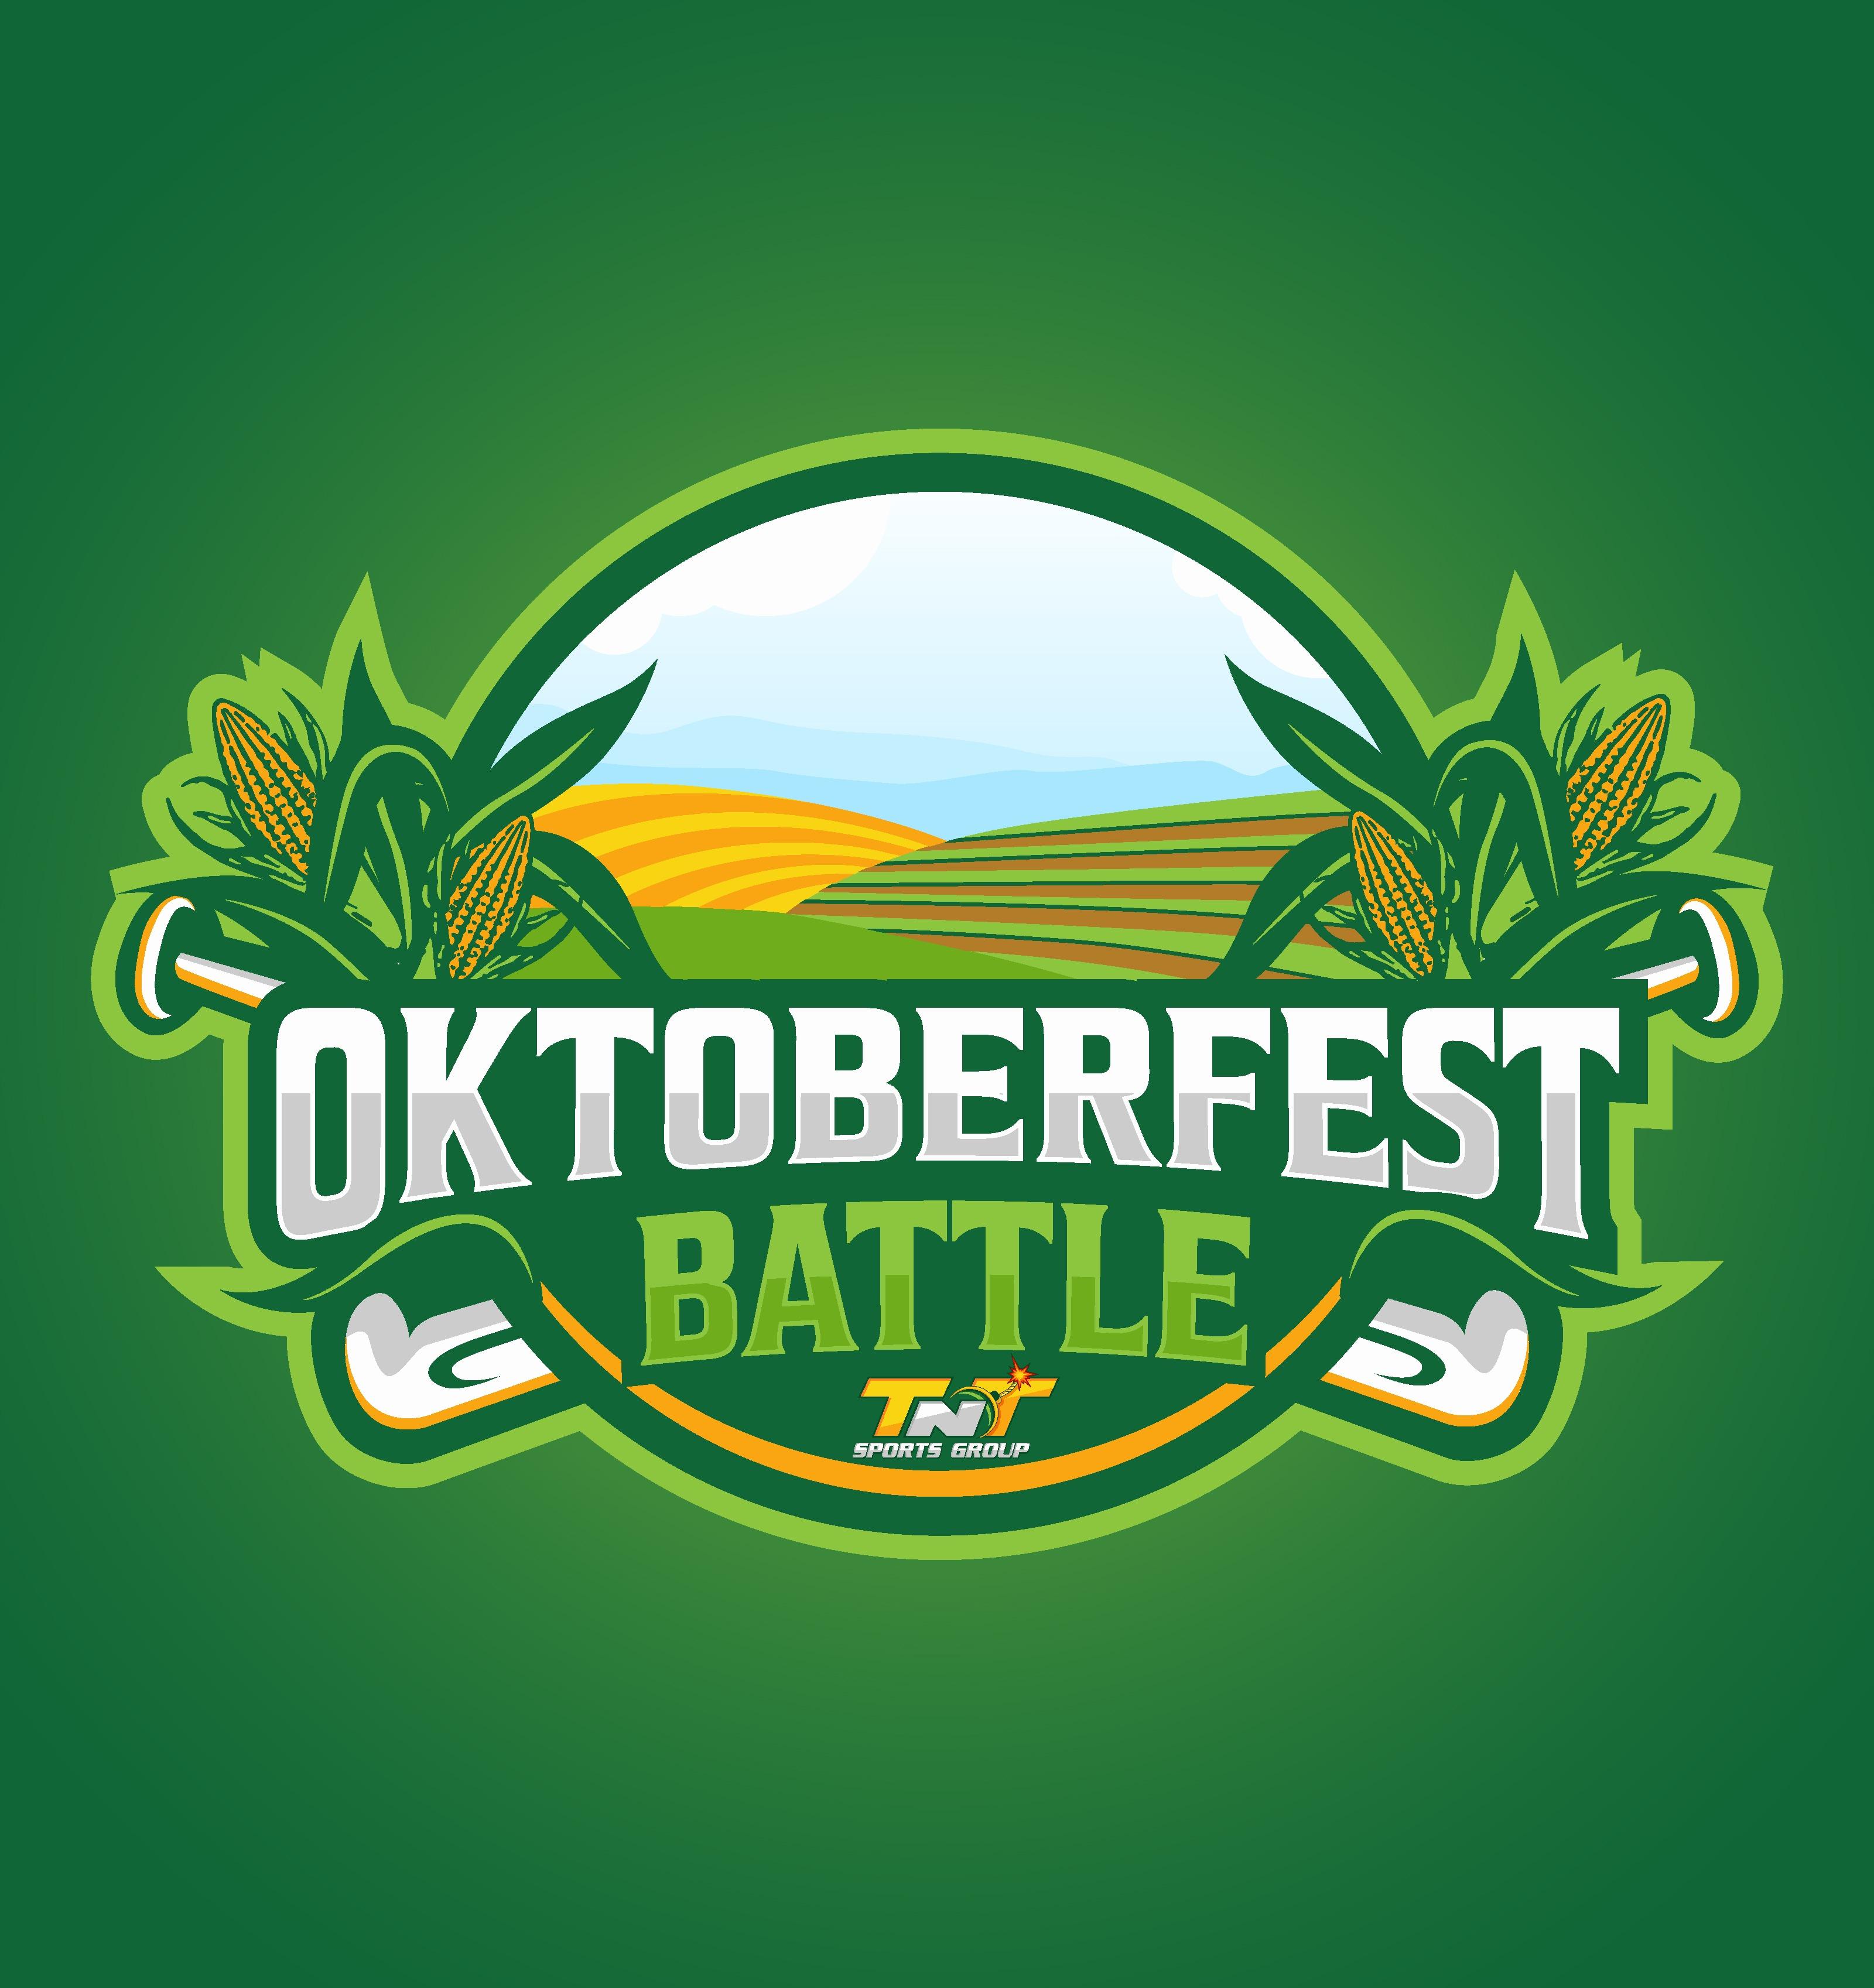 TNT Sports Group Oktoberfest Battle